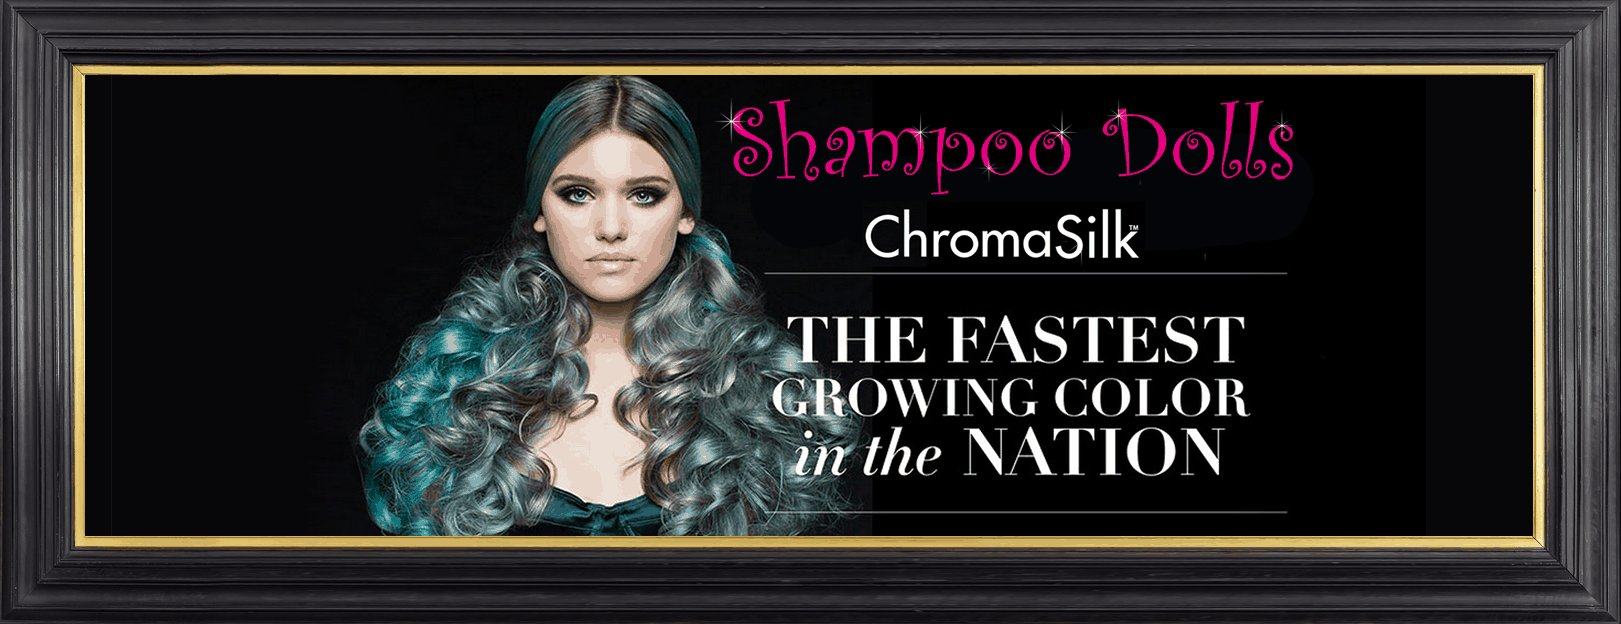 shampoo dolls hair cottage grove, shampoo dolls in cottage grove Oregon, best hair styling in cottage grove, shampoo dolls salon, best salon in cottage grove Oregon